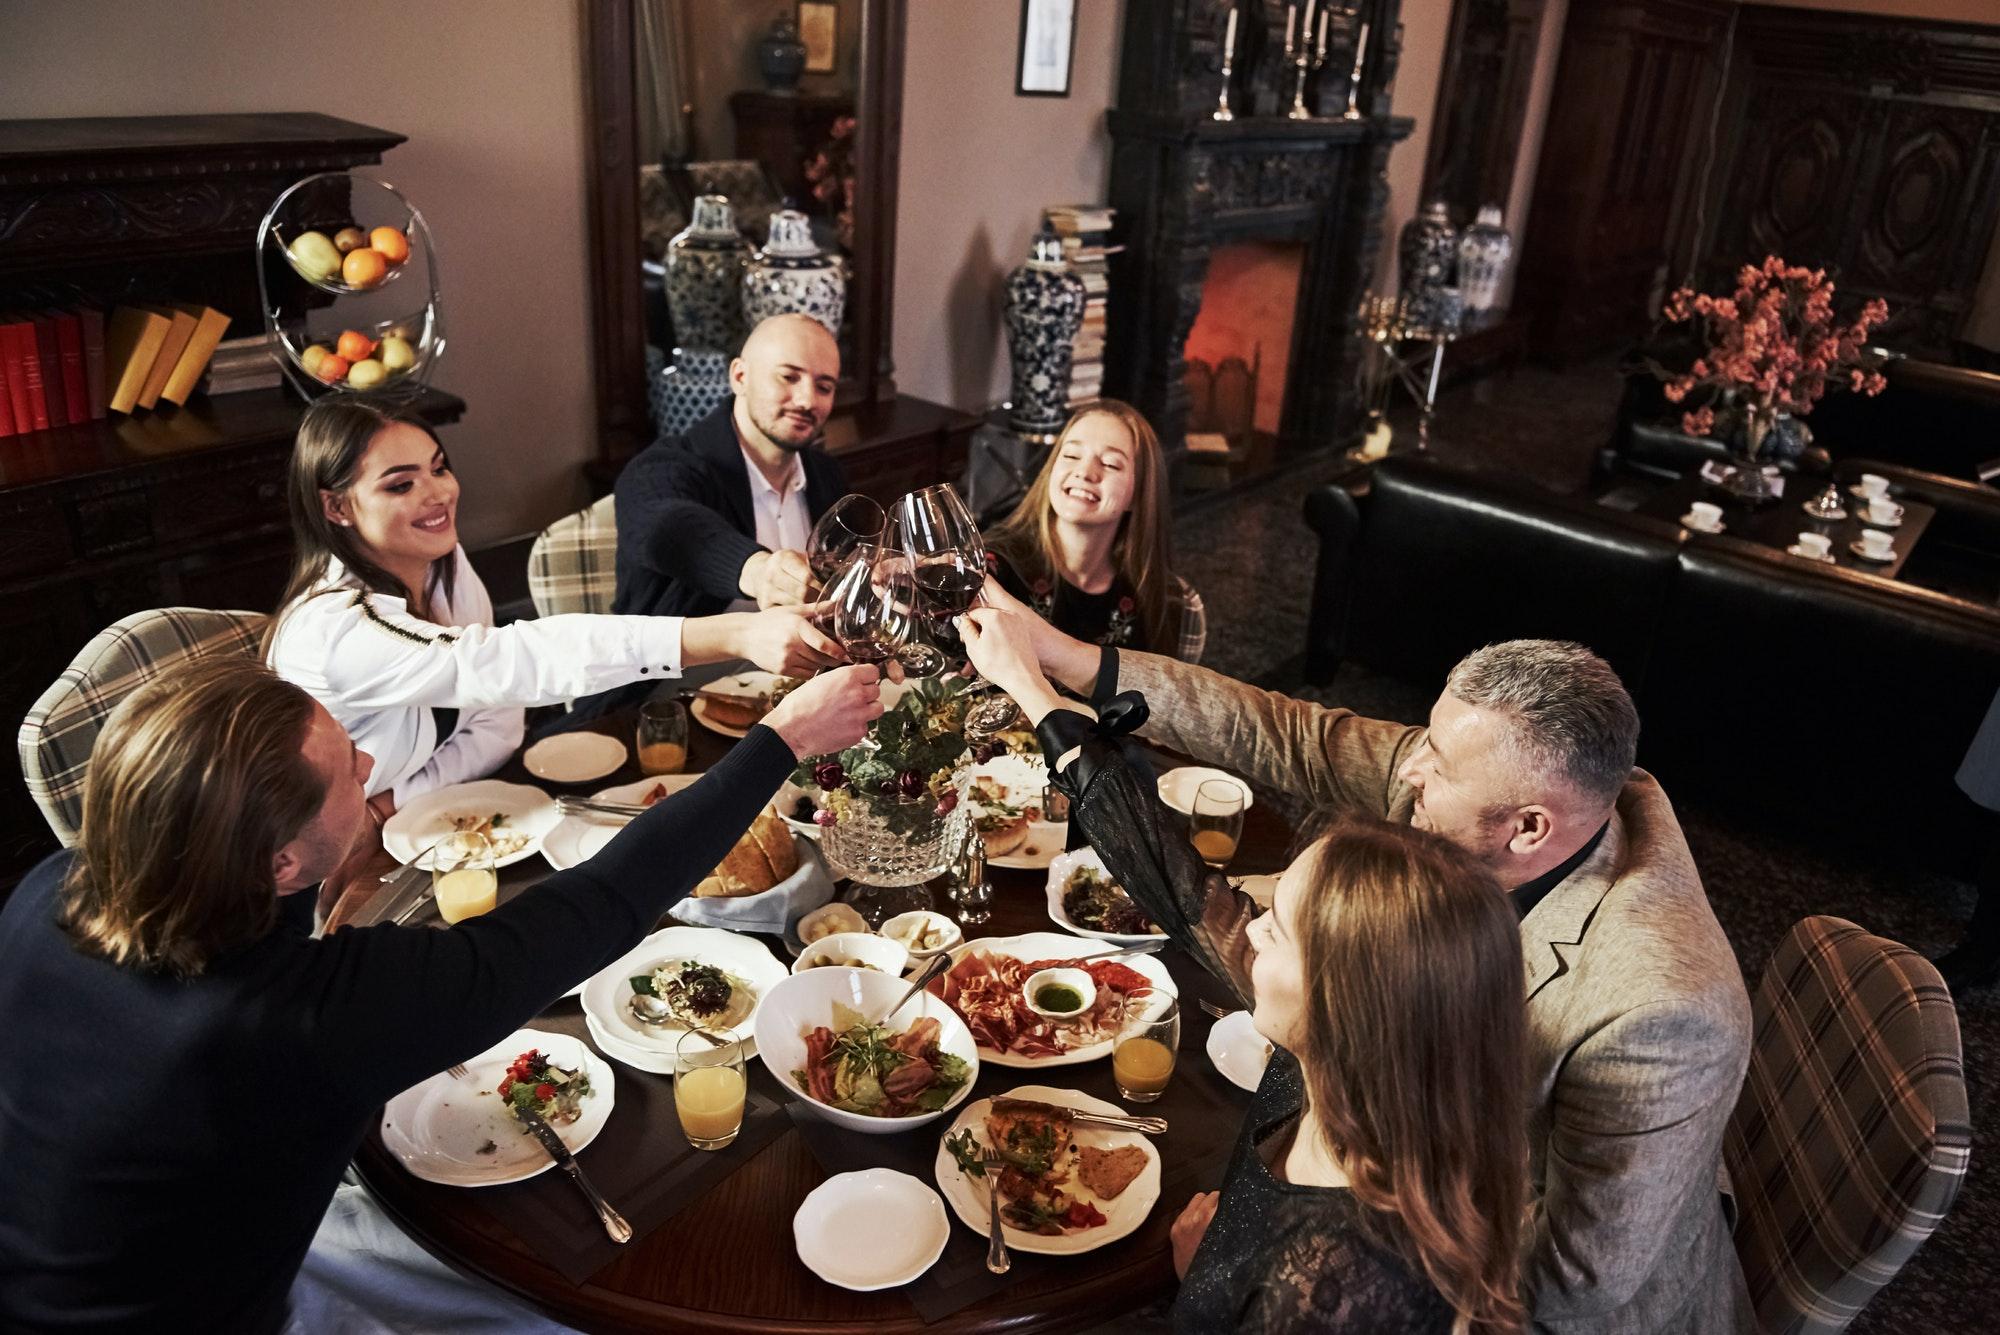 Rich people. Family friends having nice time in beautiful luxury modern restaurant